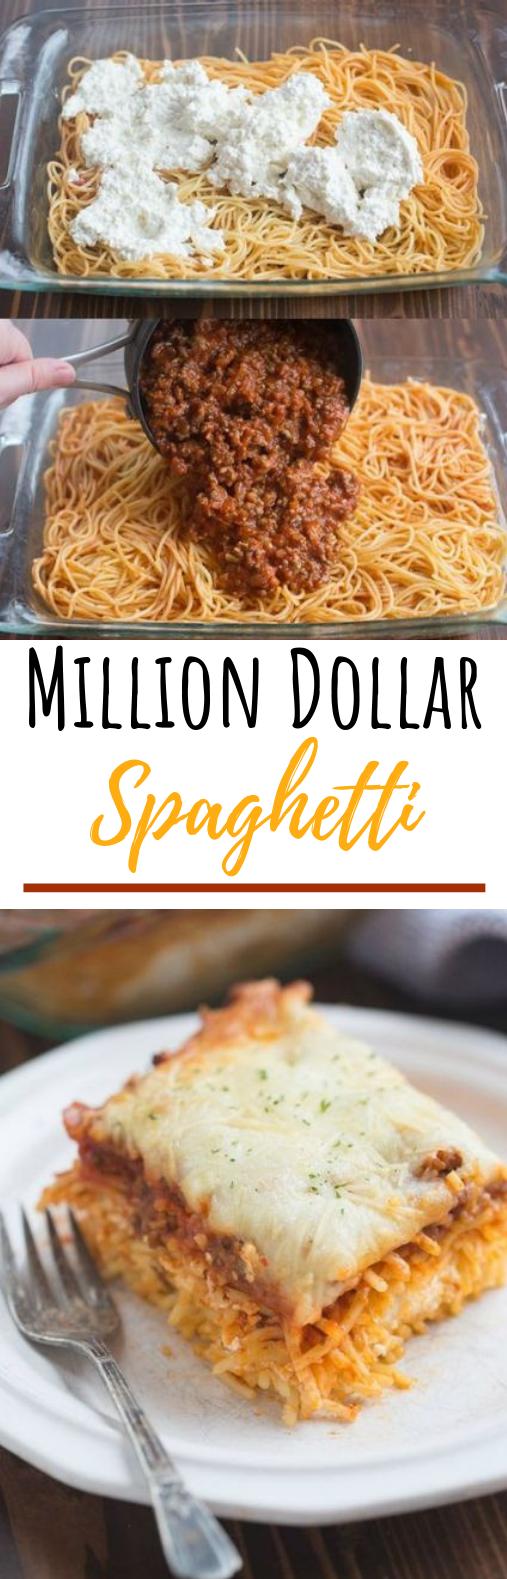 Million Dollar Spaghetti #dinner #spaghetti